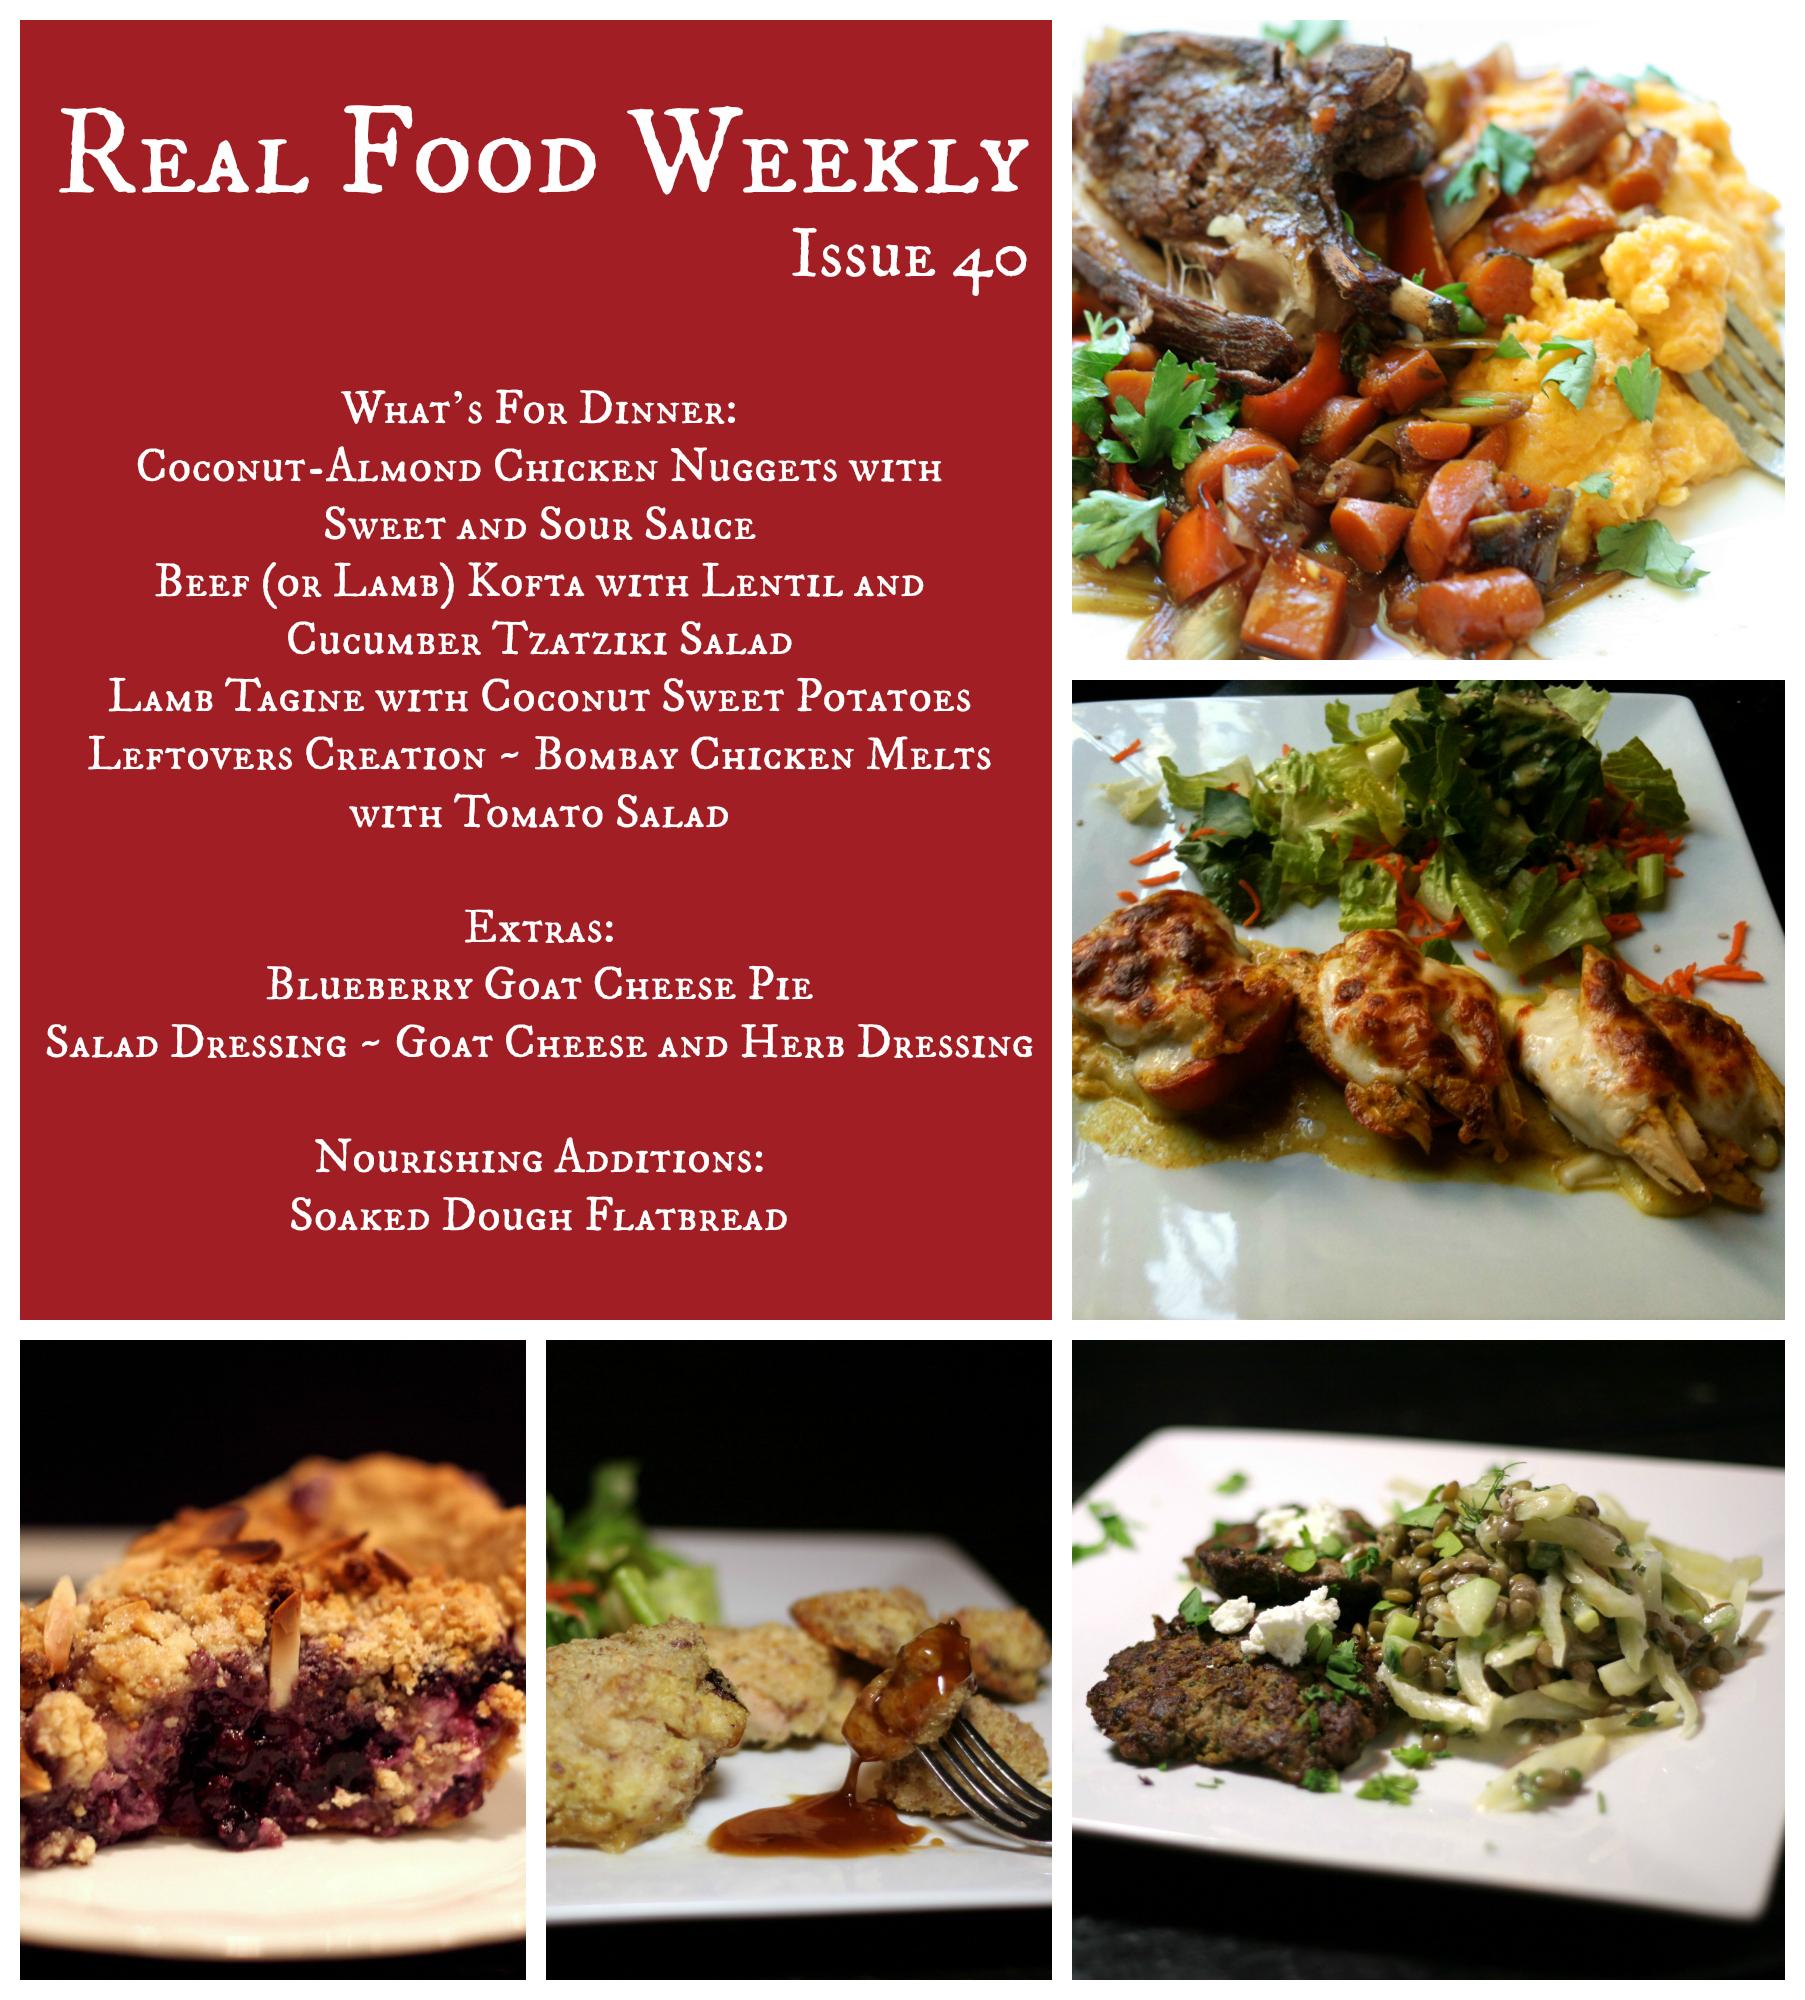 July 27, 2013 Meal Plan